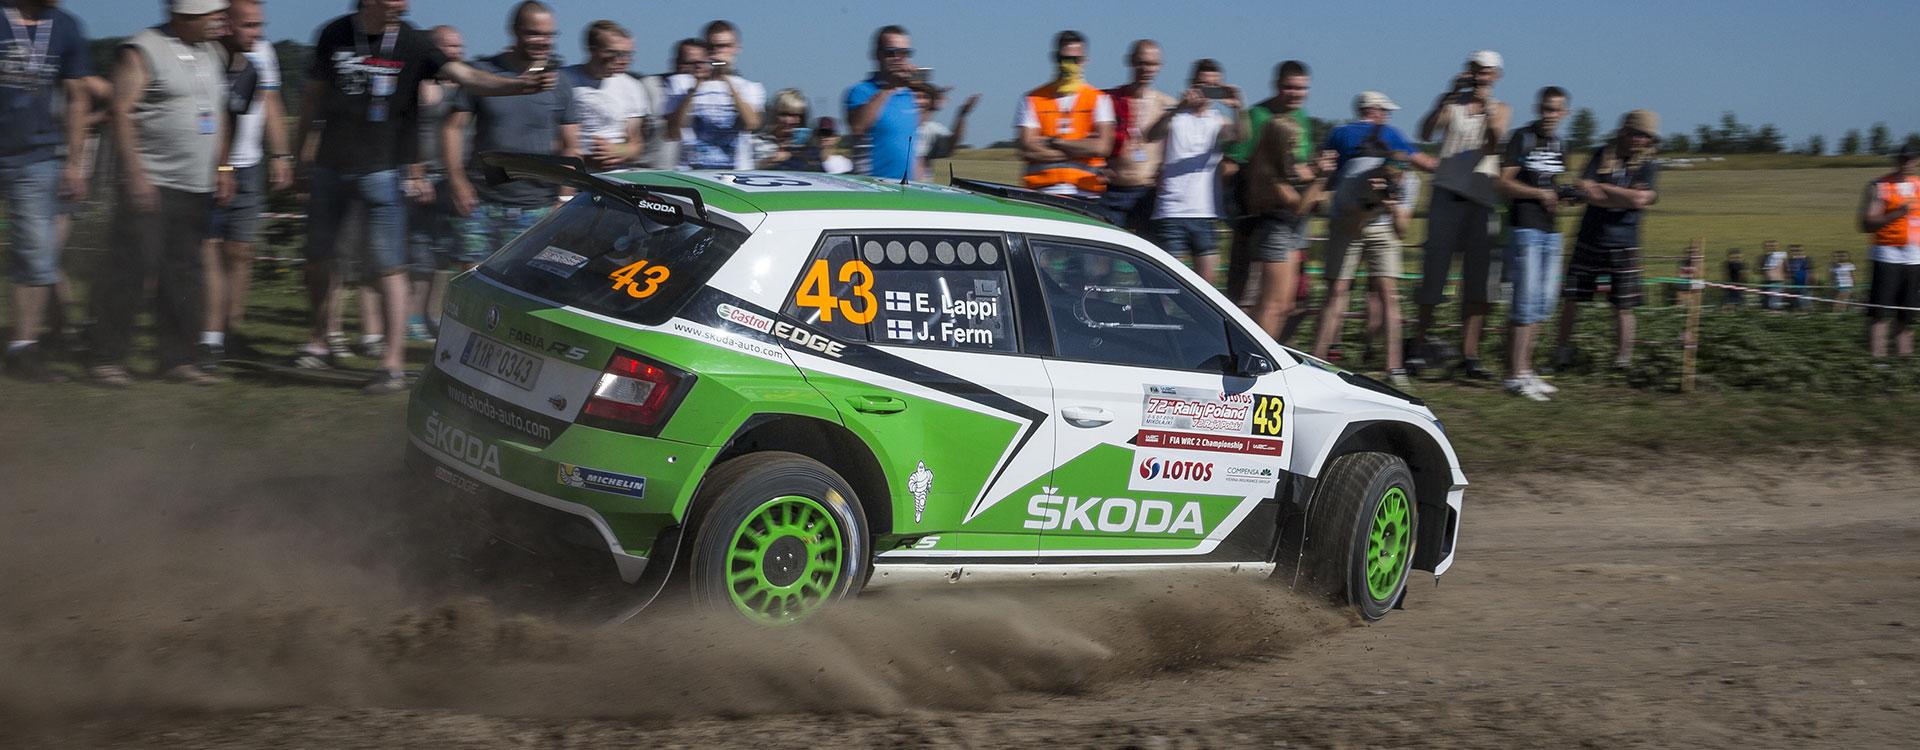 WRC 2: ŠKODA looks to continue winning ways at full-throttle show in Poland